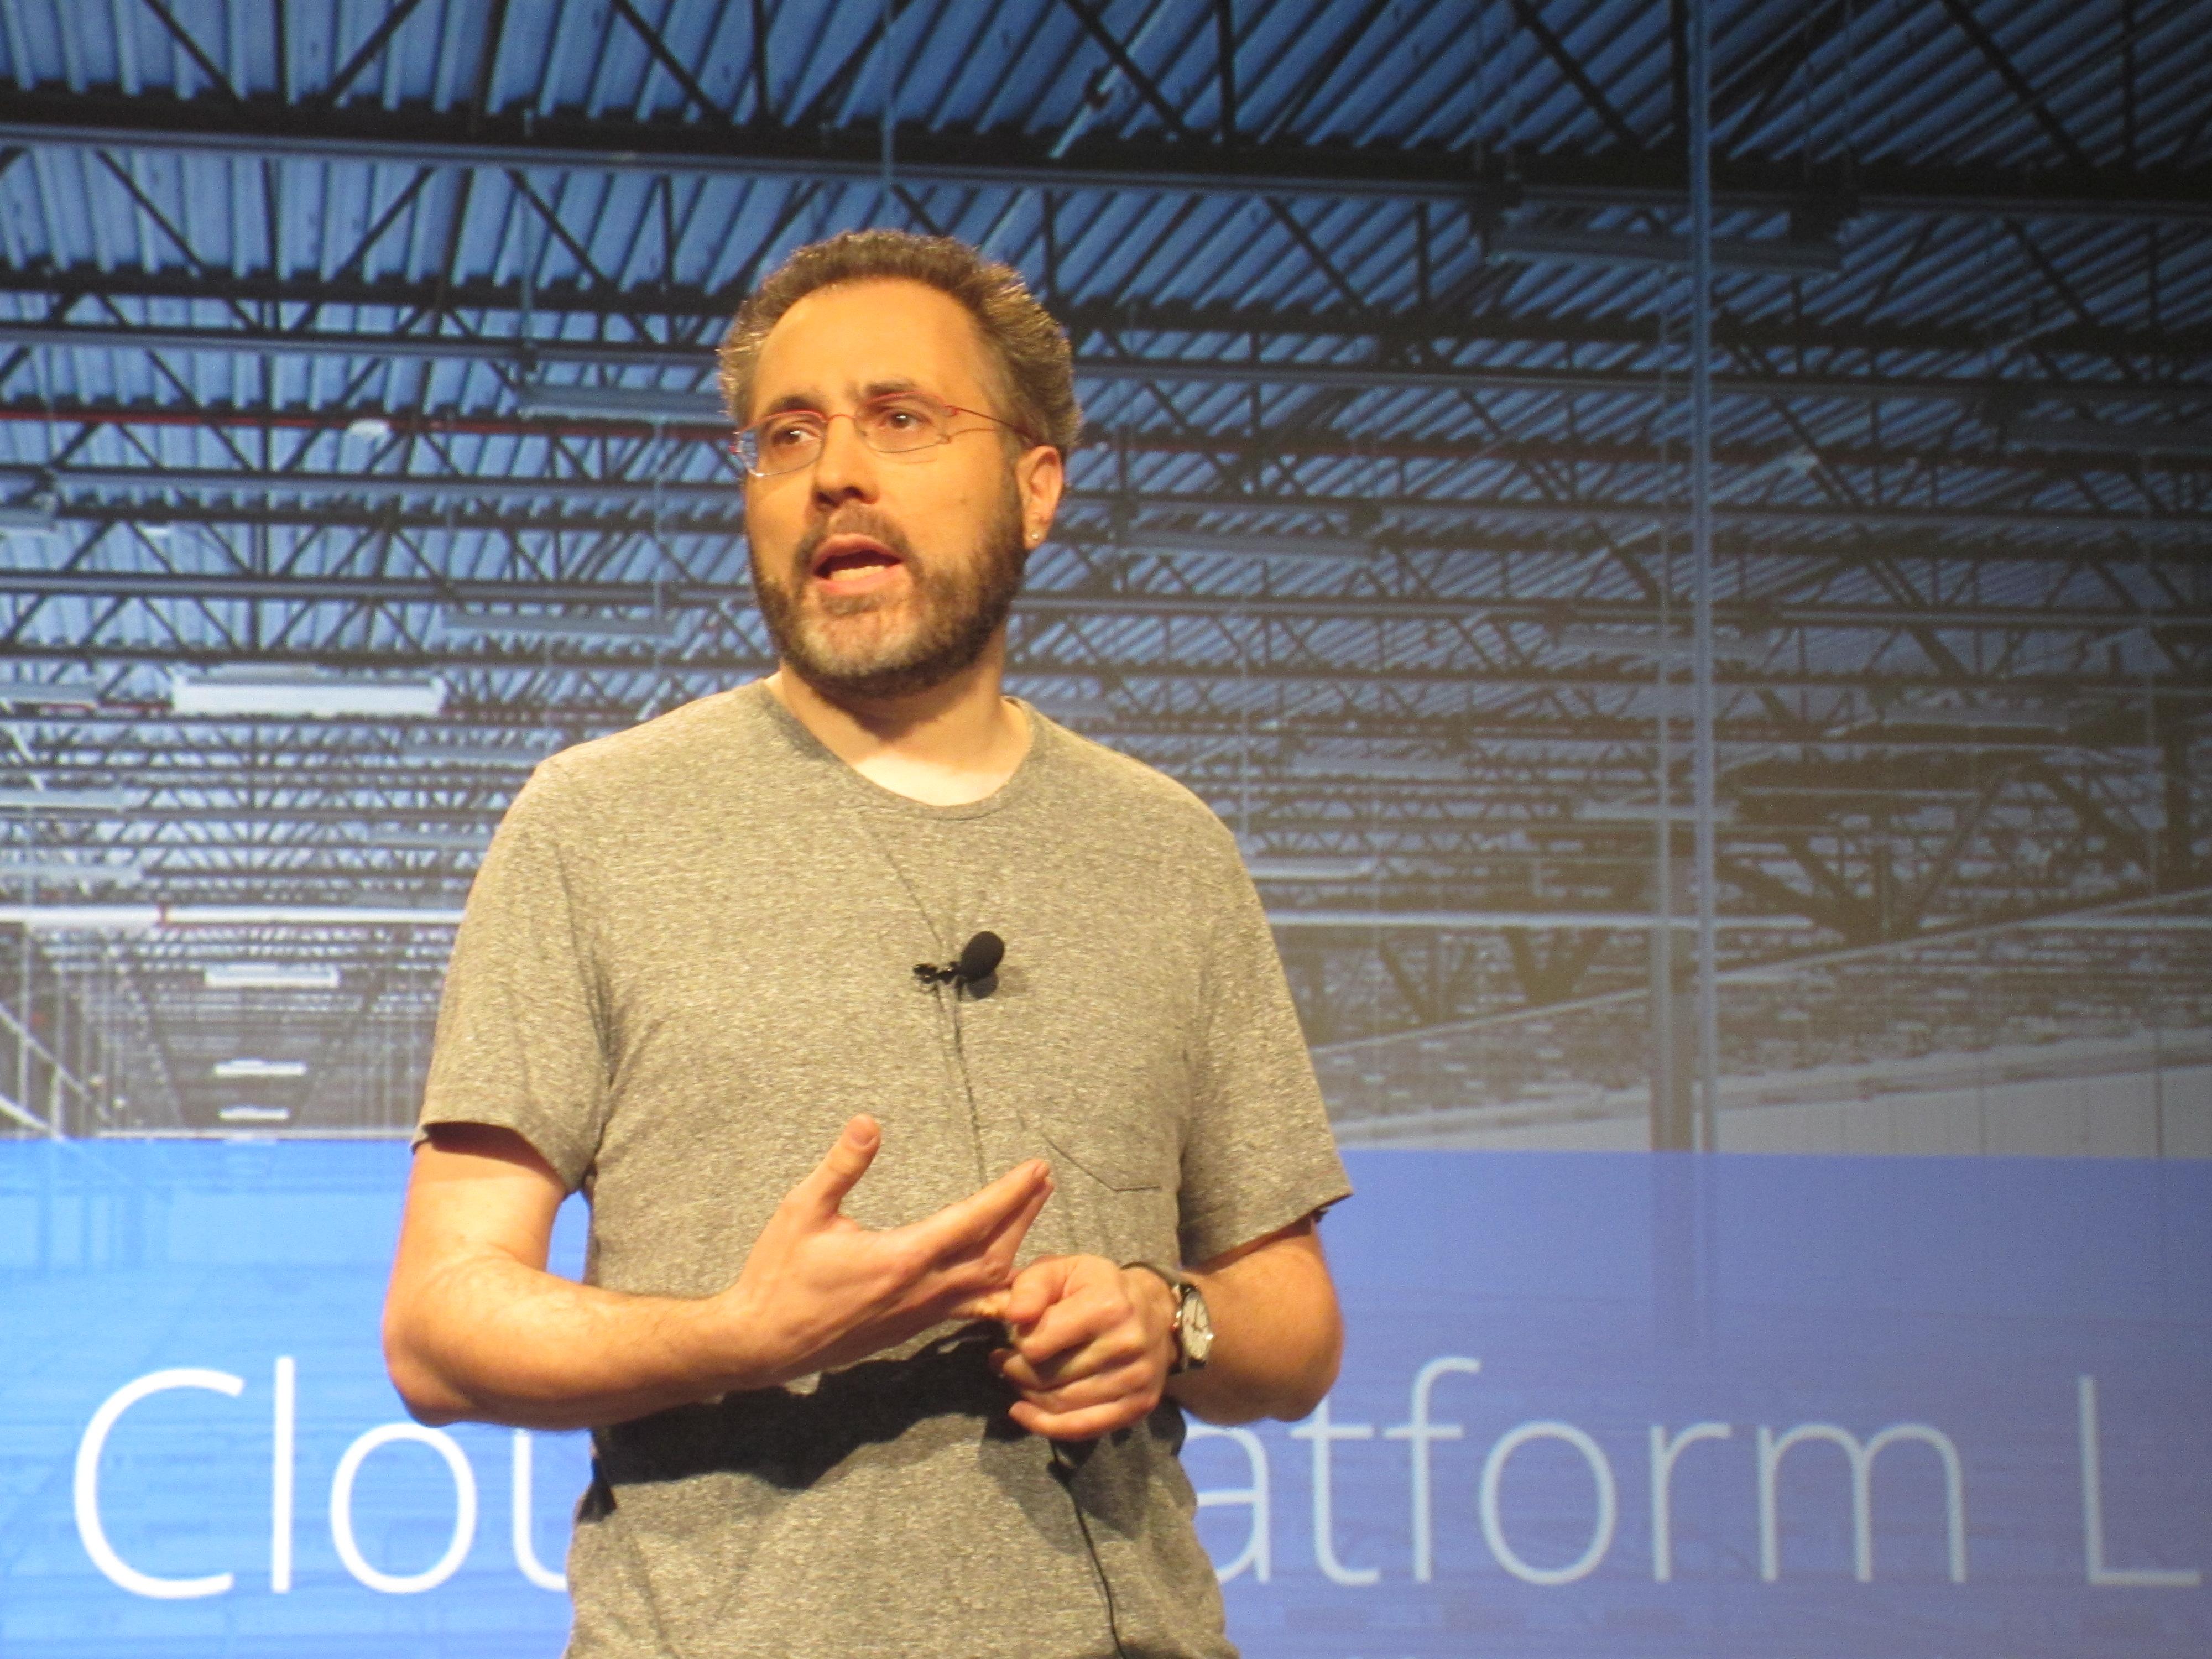 Urs Hölzle, Google's SVP of  technical infrastructure.